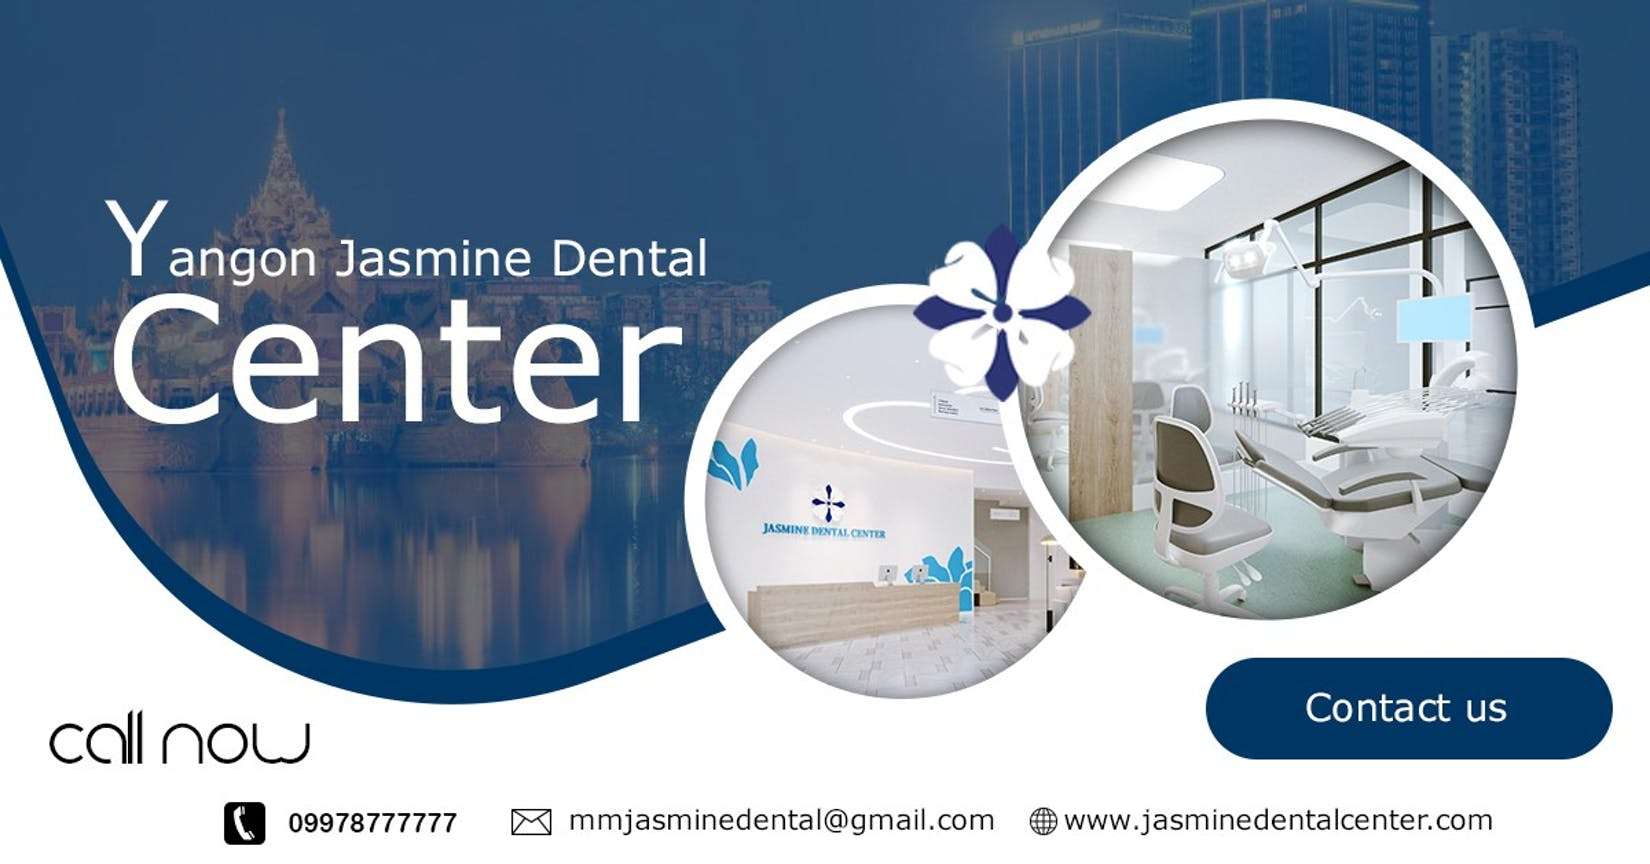 Yangon Jasmine Dental Center | Beauty